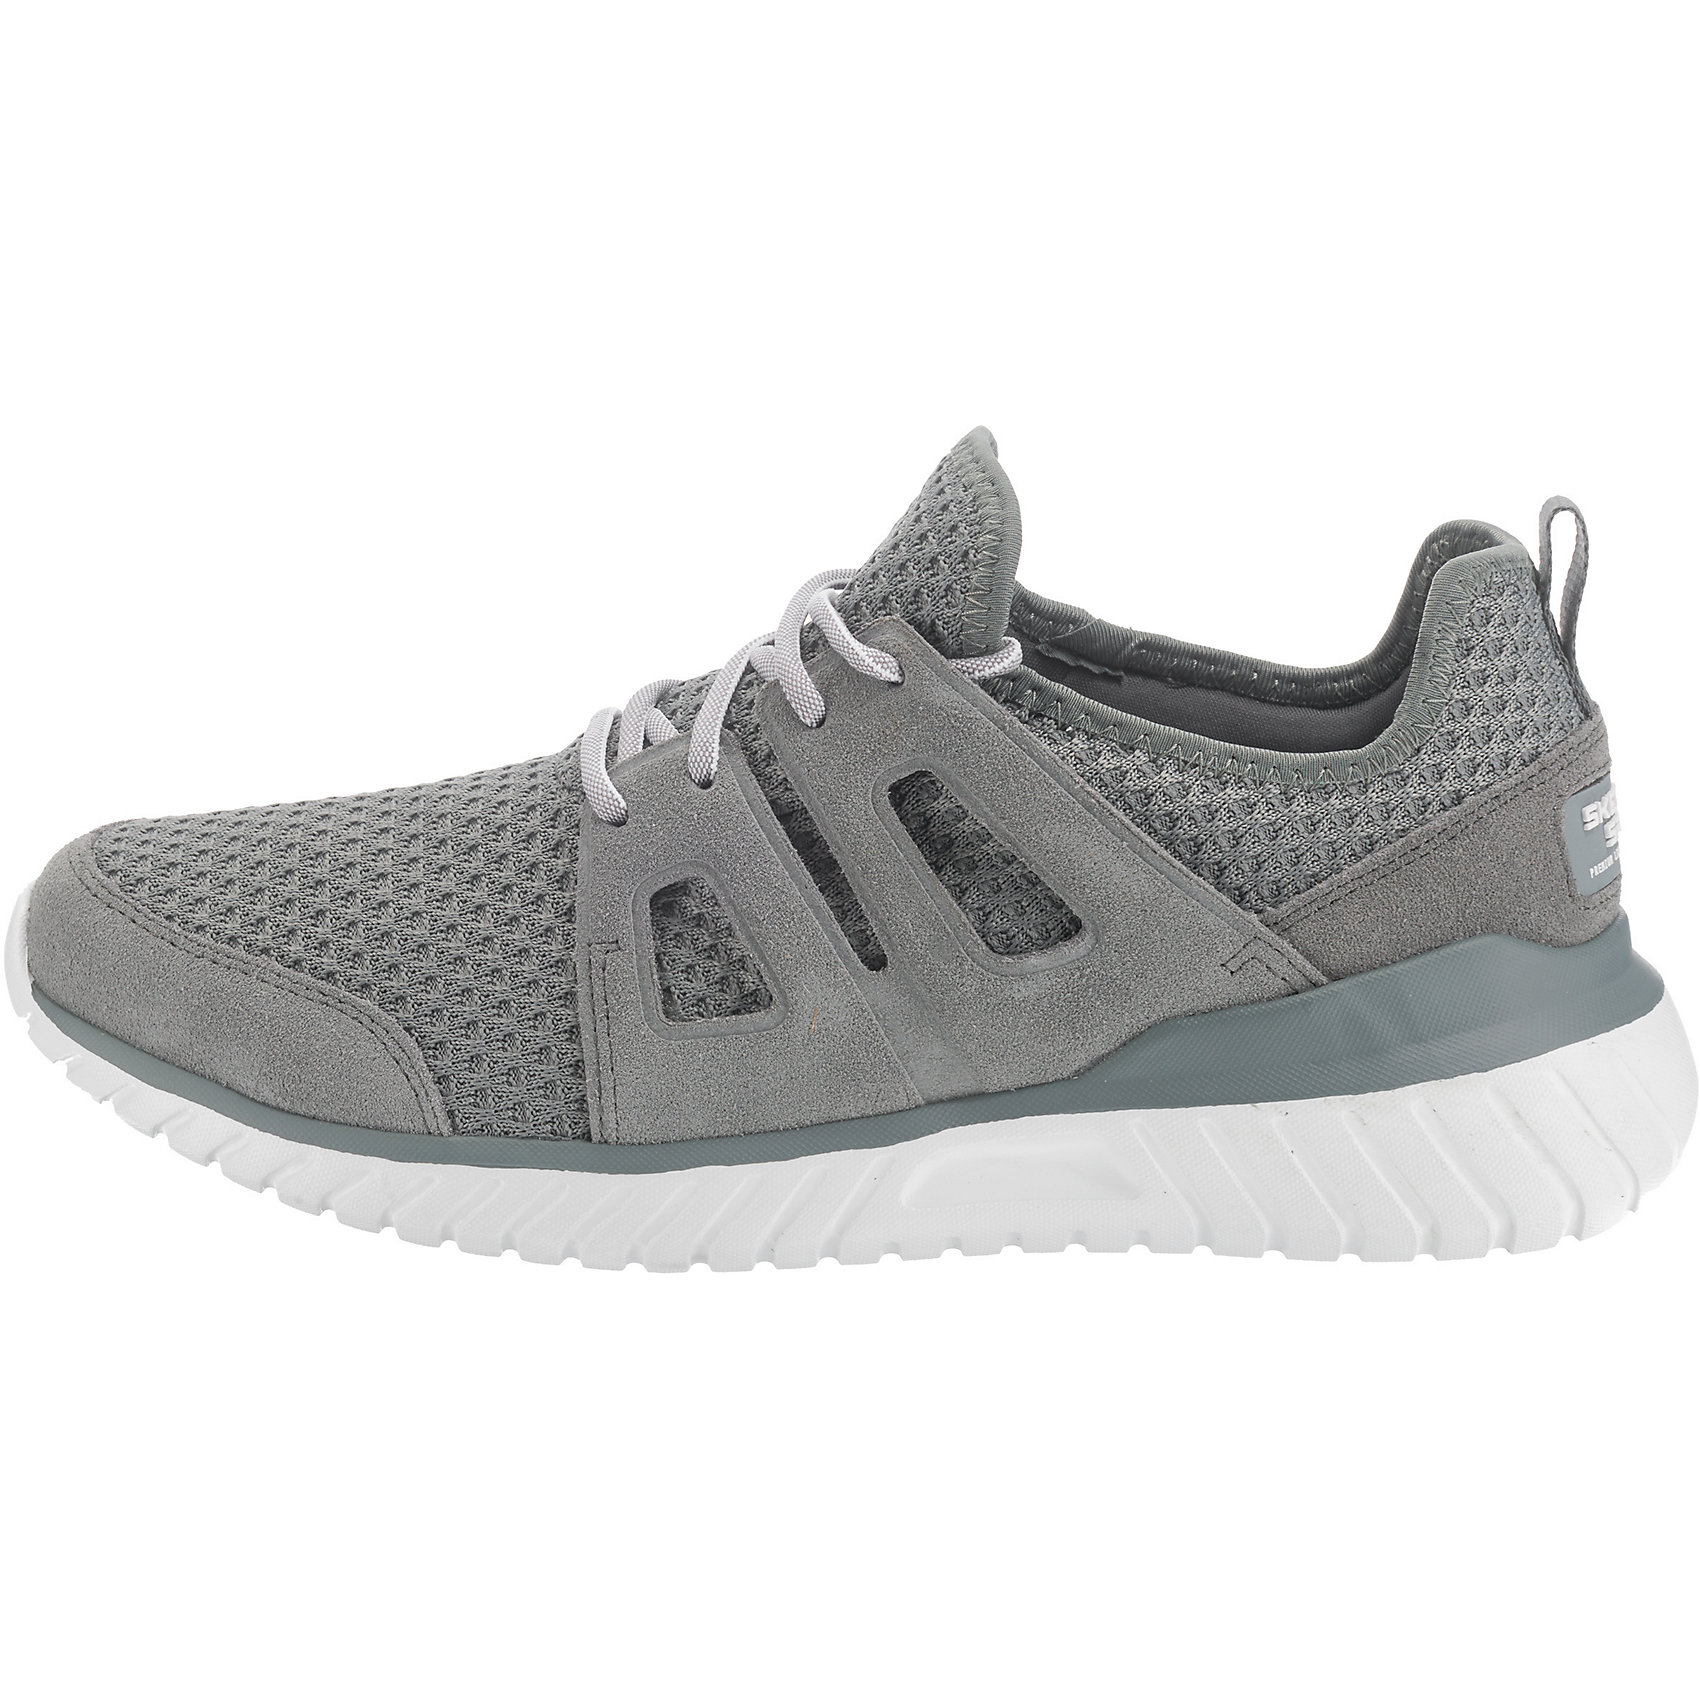 Neu-SKECHERS-Rough-Cut-Sneakers-Low-7385015-fuer-Herren-grau-kombi